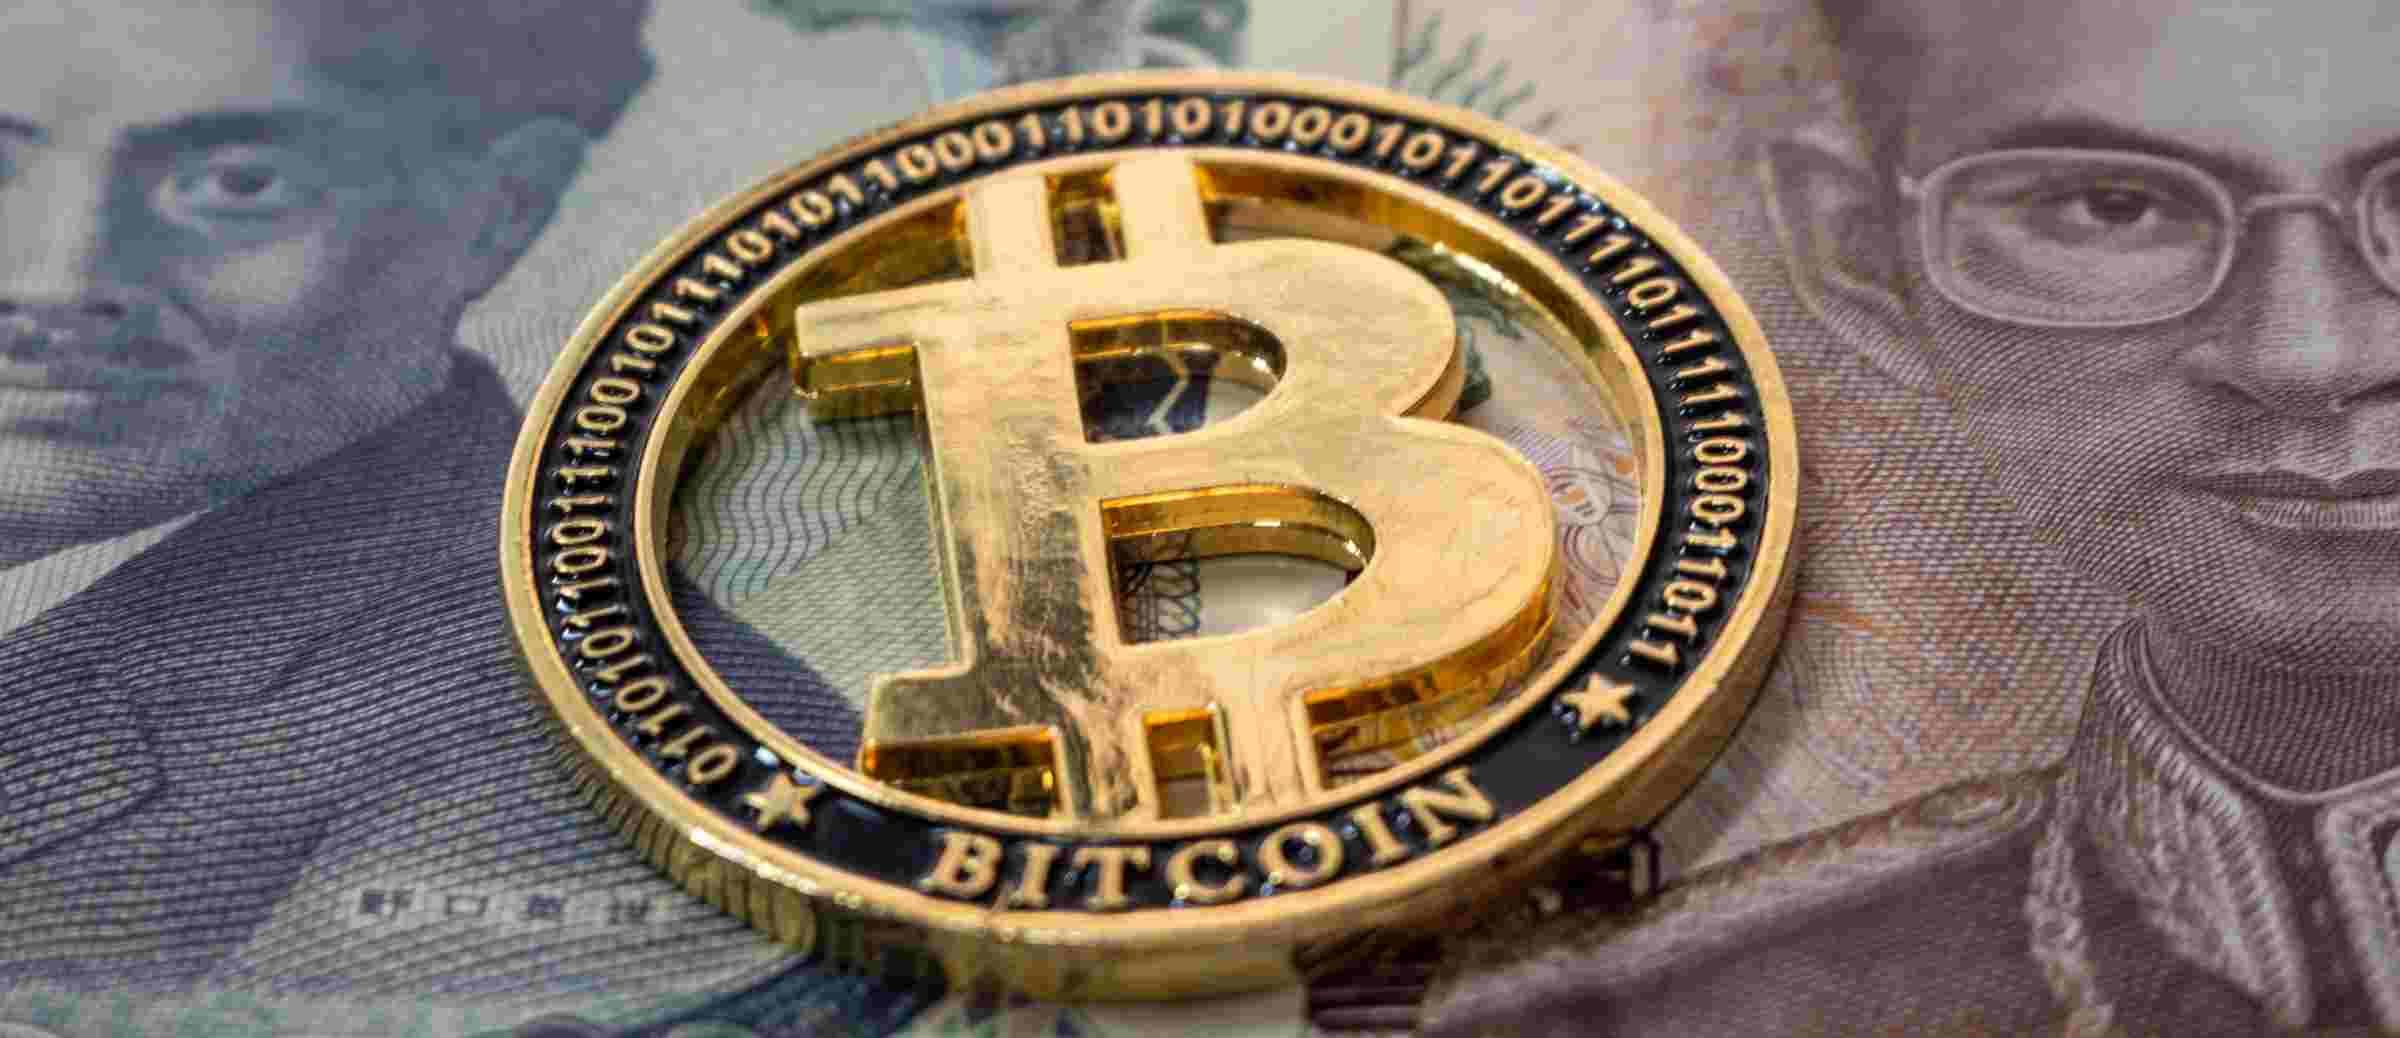 Arbitragem de Bitcoin: Como funciona?